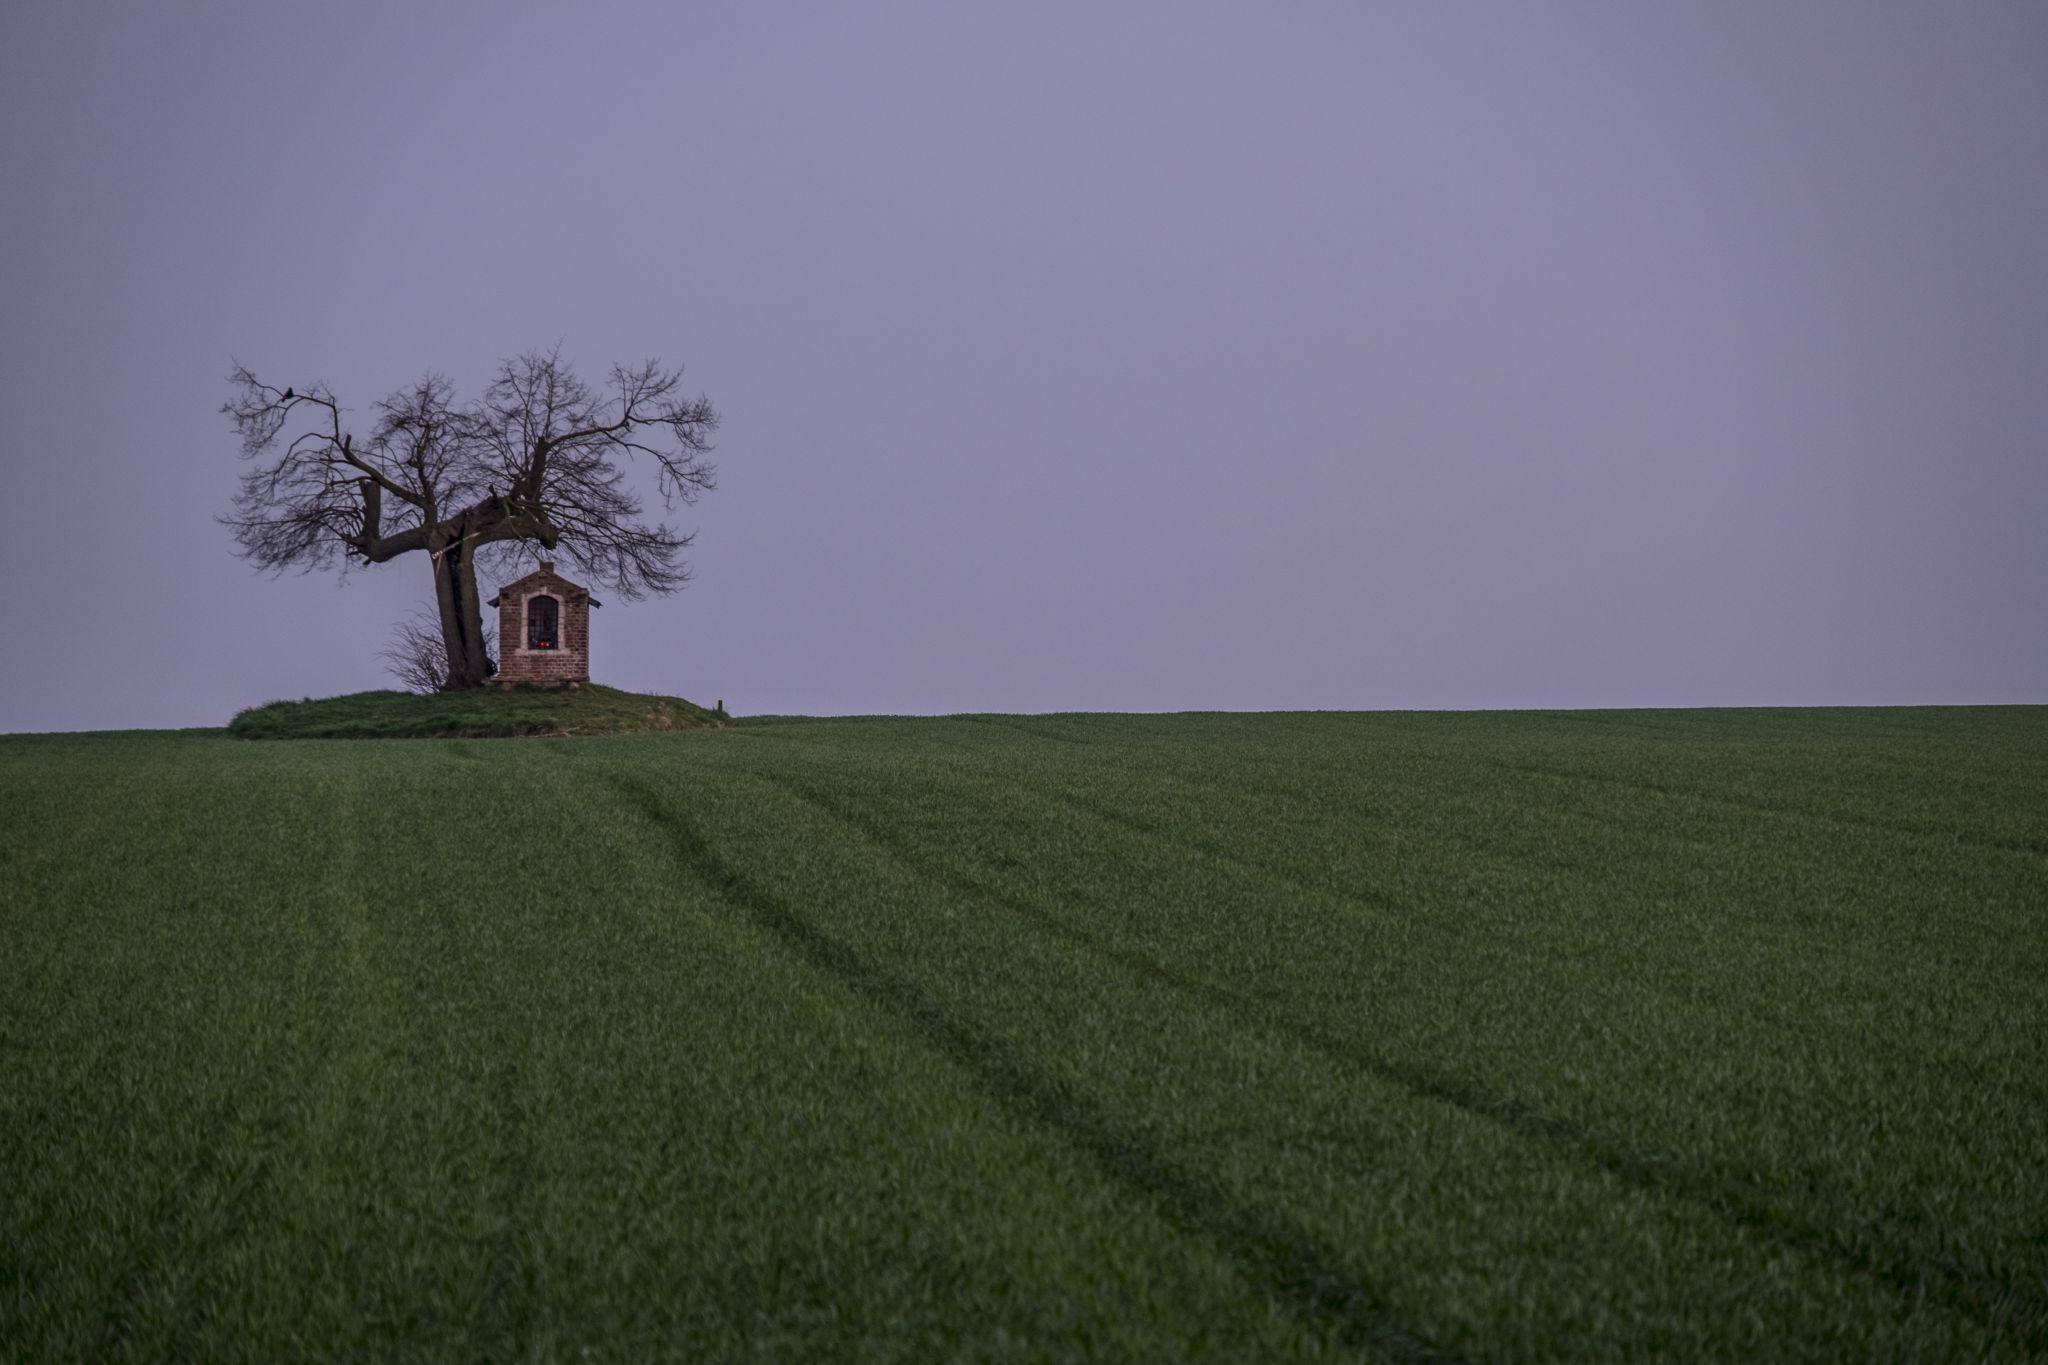 Kapel Horst, Belgium